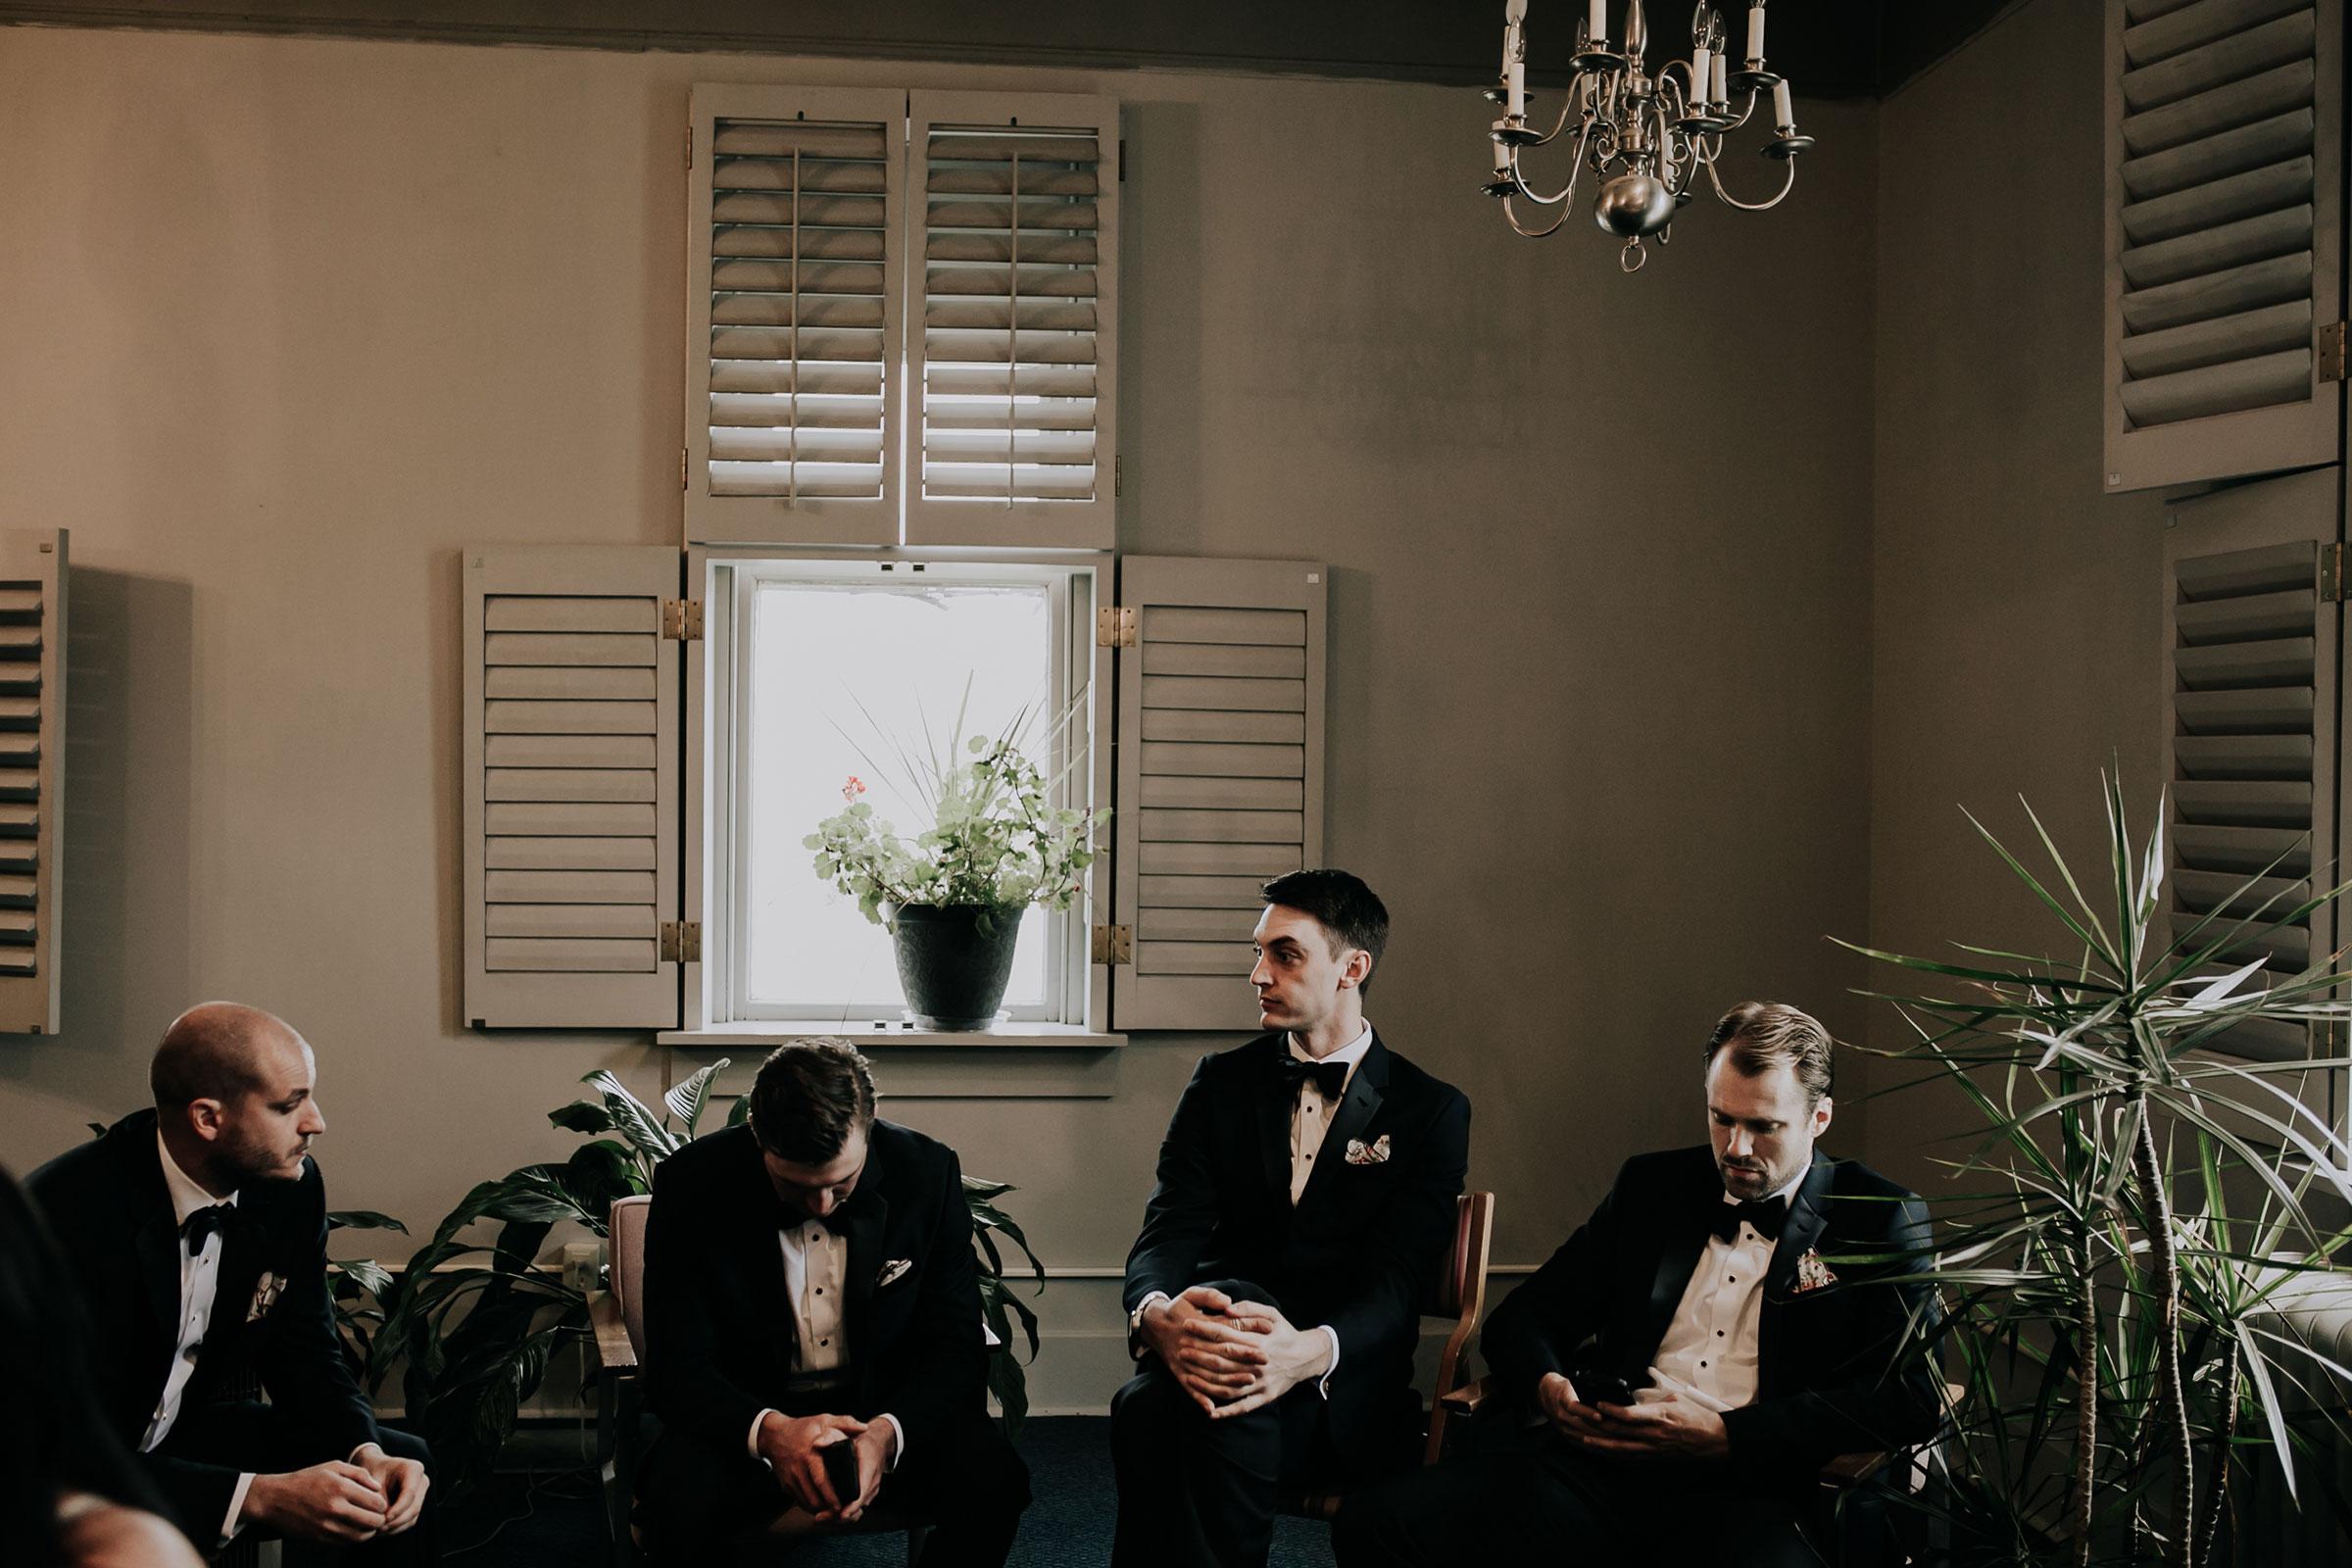 groomsmen-waiting-for-ceremony-to-start-st-johns-church-at-creighton-omaha-nebraska-raelyn-ramey-photography.jpg